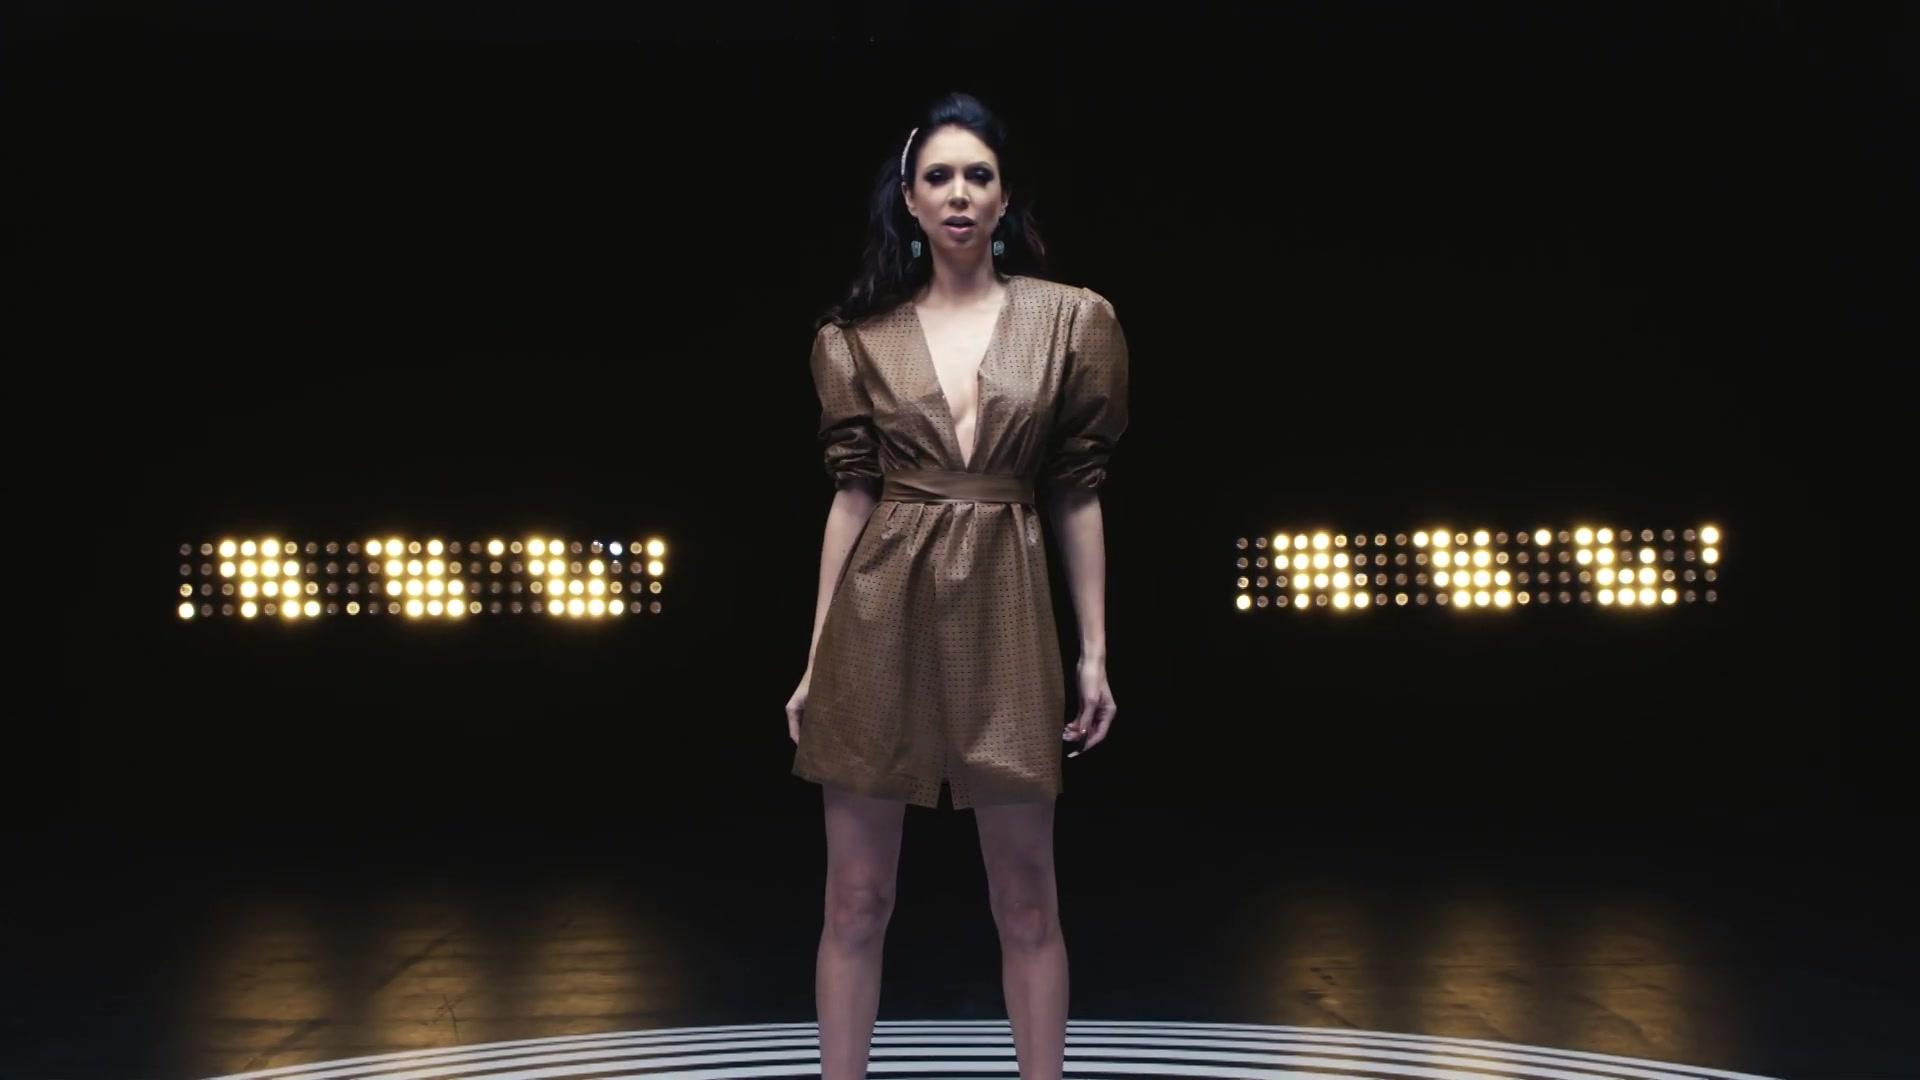 Laura Põldvere - Dont Shut Me Out - Eesti TOP-10